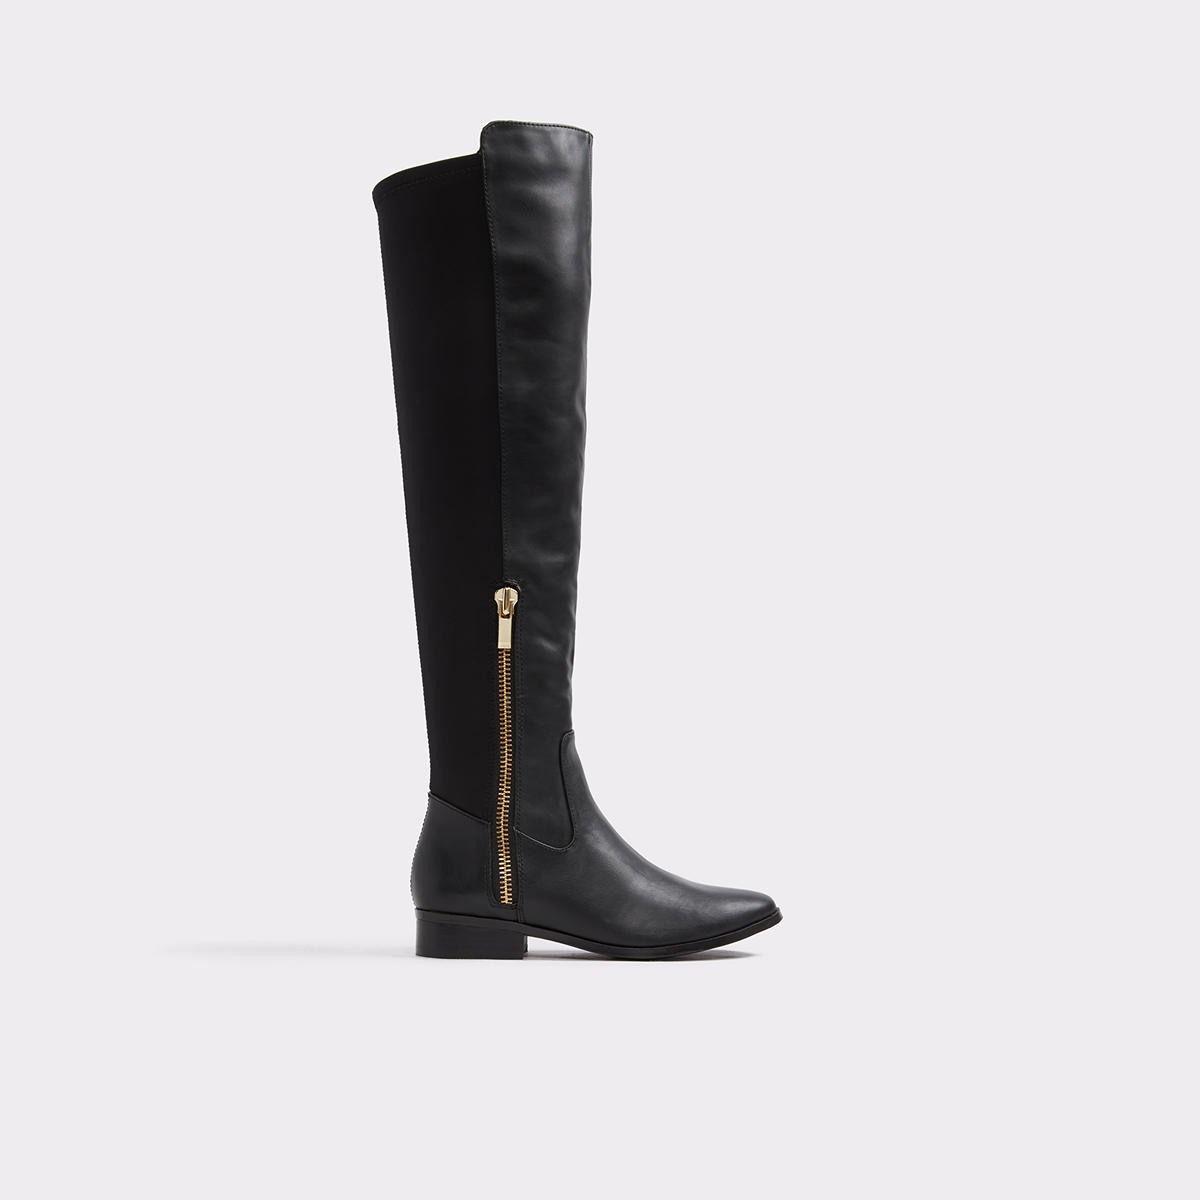 Kaoresa Black Women's Boots | ALDO US